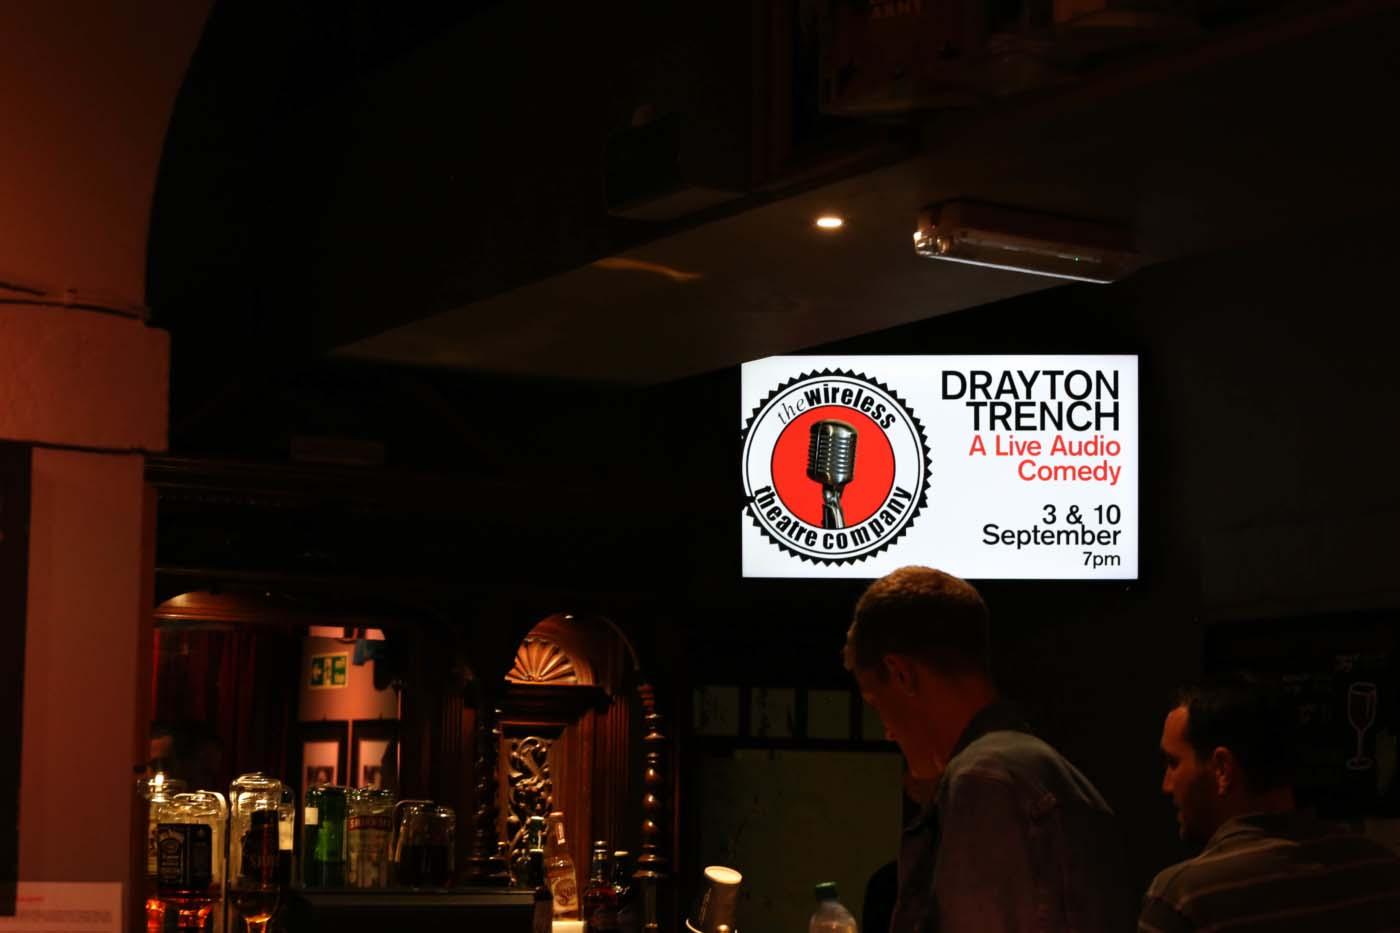 Drayton Trench